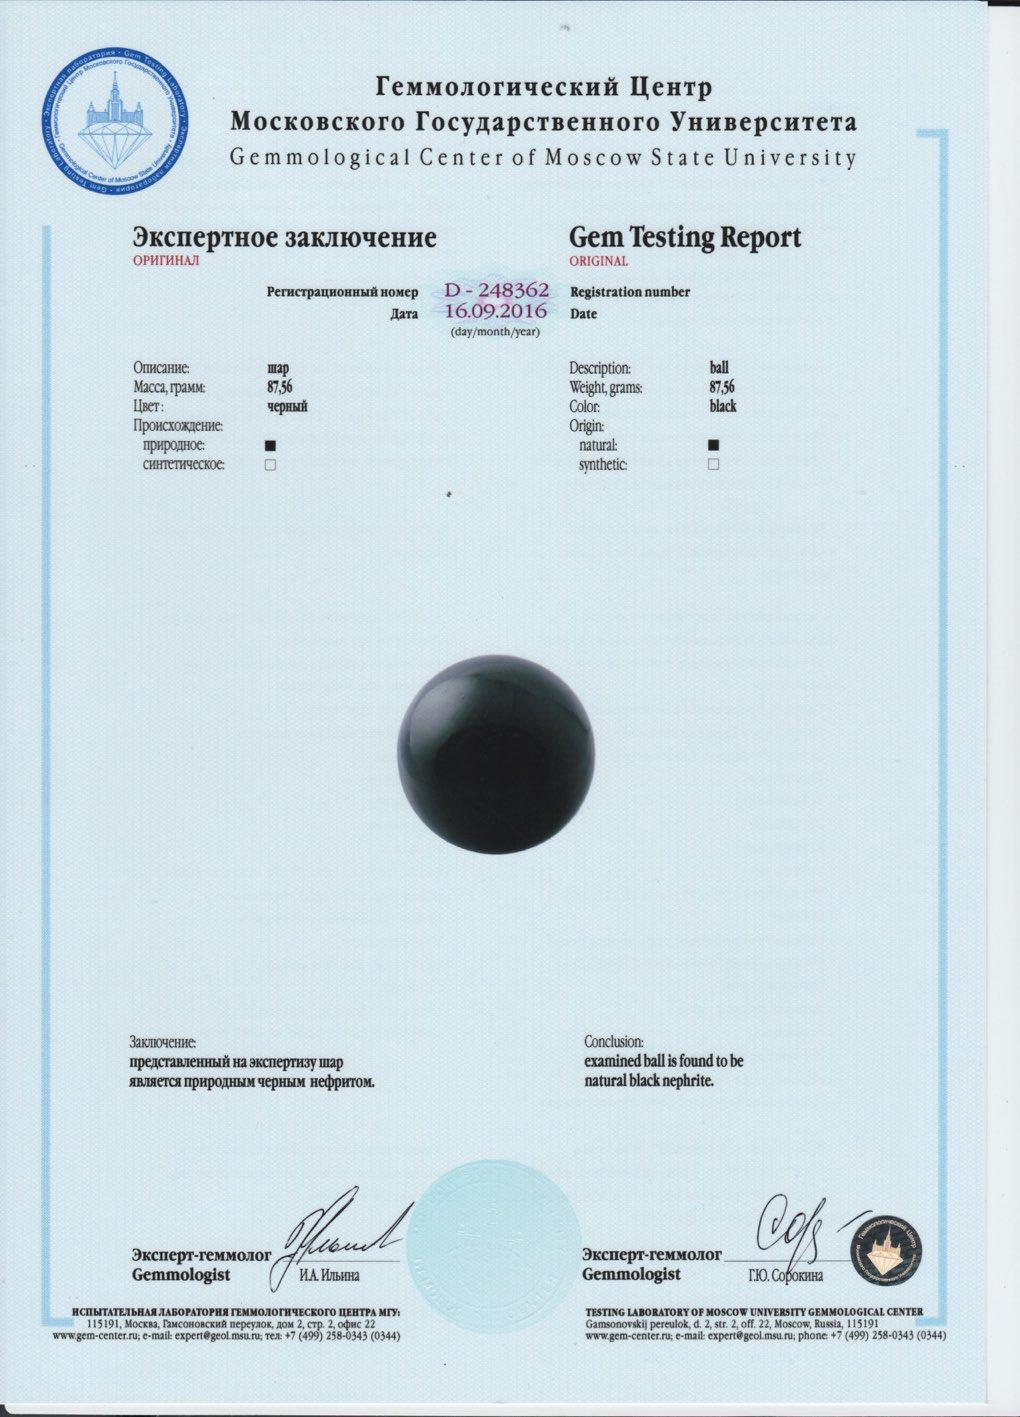 https://mineralmarket.ru/img/certificate/79/1485964421.jpeg